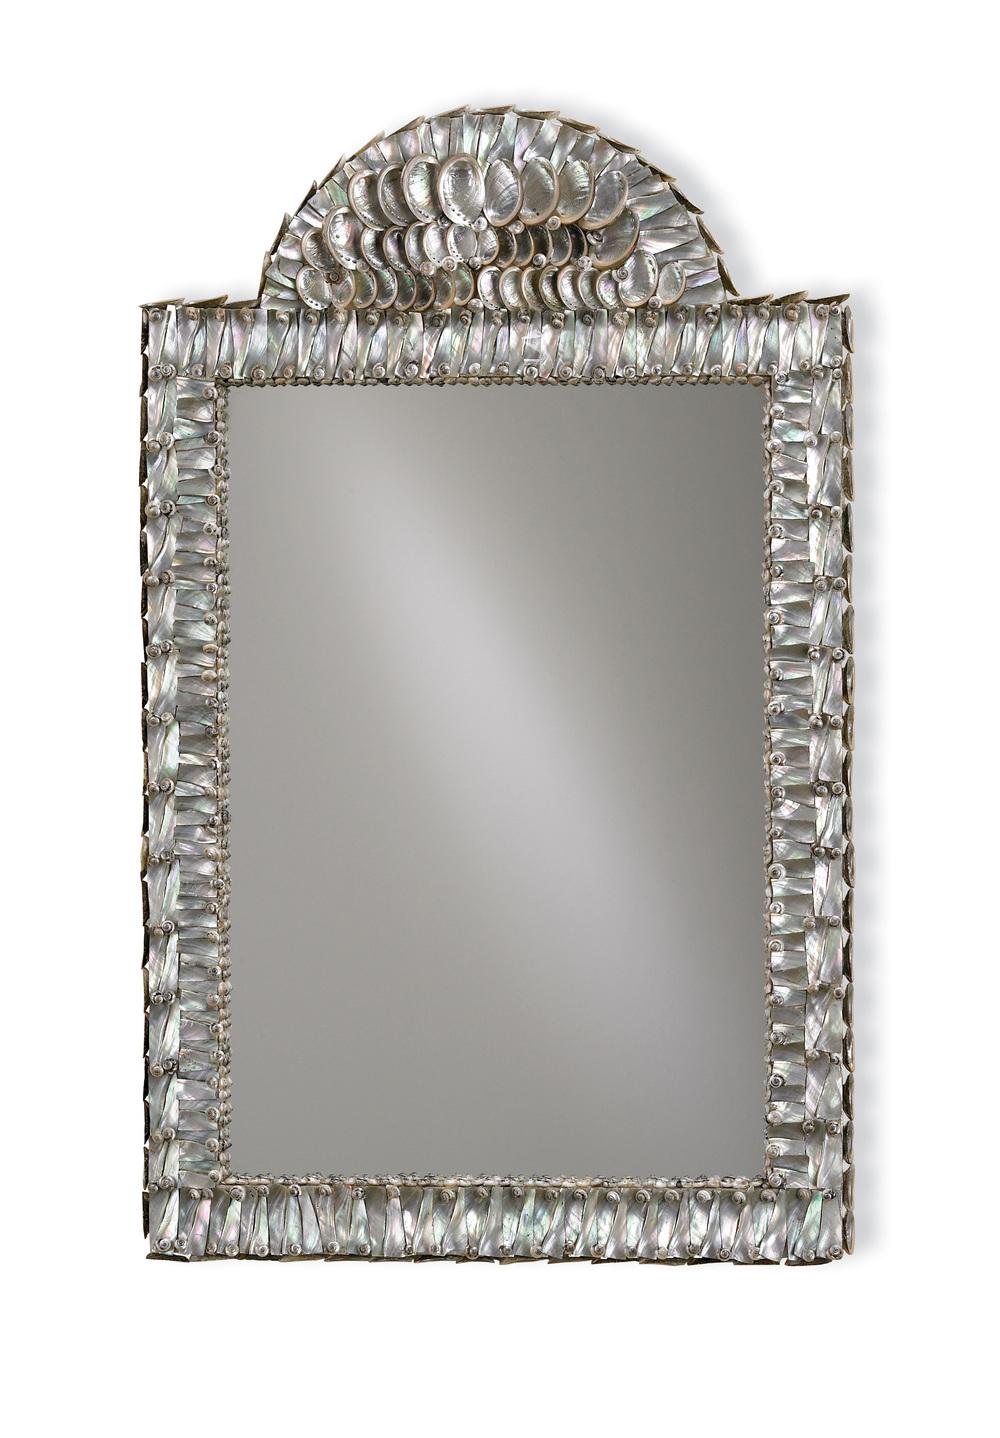 Currey & Company - Abalone Mirror